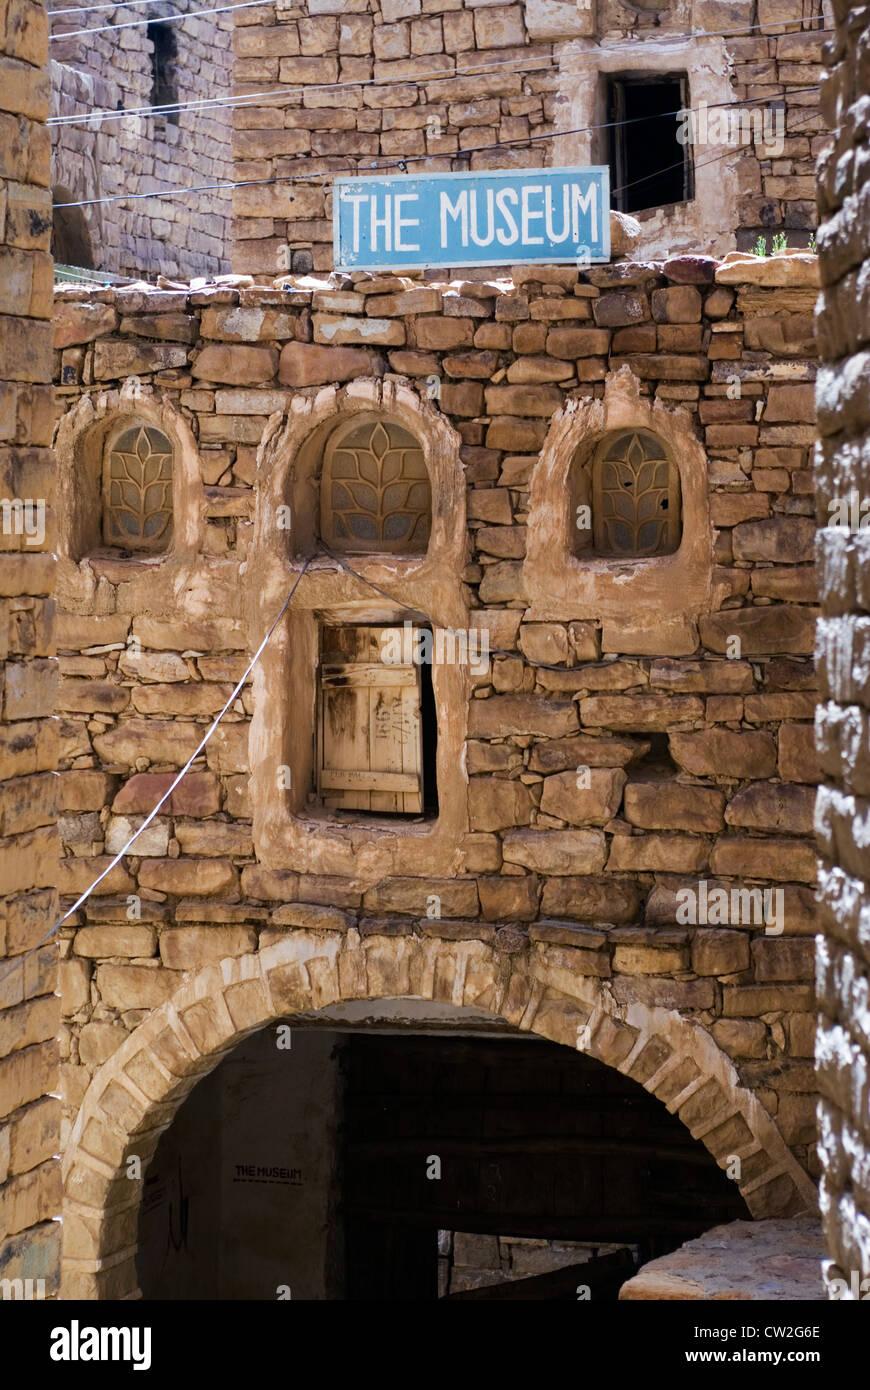 Museum of Thula, the Highlands region, Yemen, Western Asia, Arabian Peninsula. - Stock Image